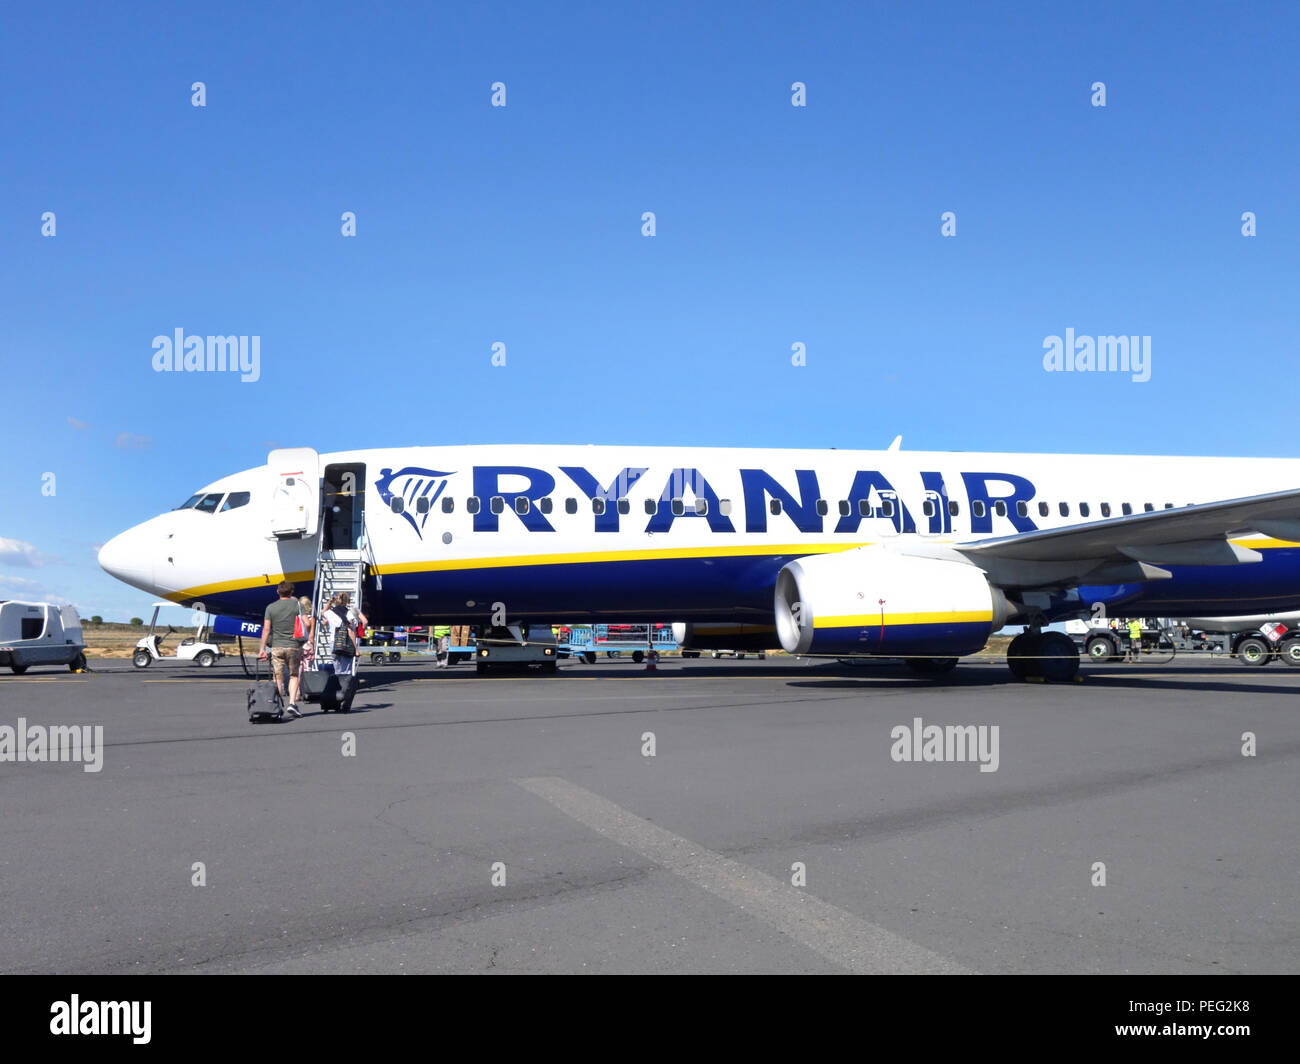 Passengers walking across the tarmac towards their homeward flight on a Ryanair plane - Stock Image